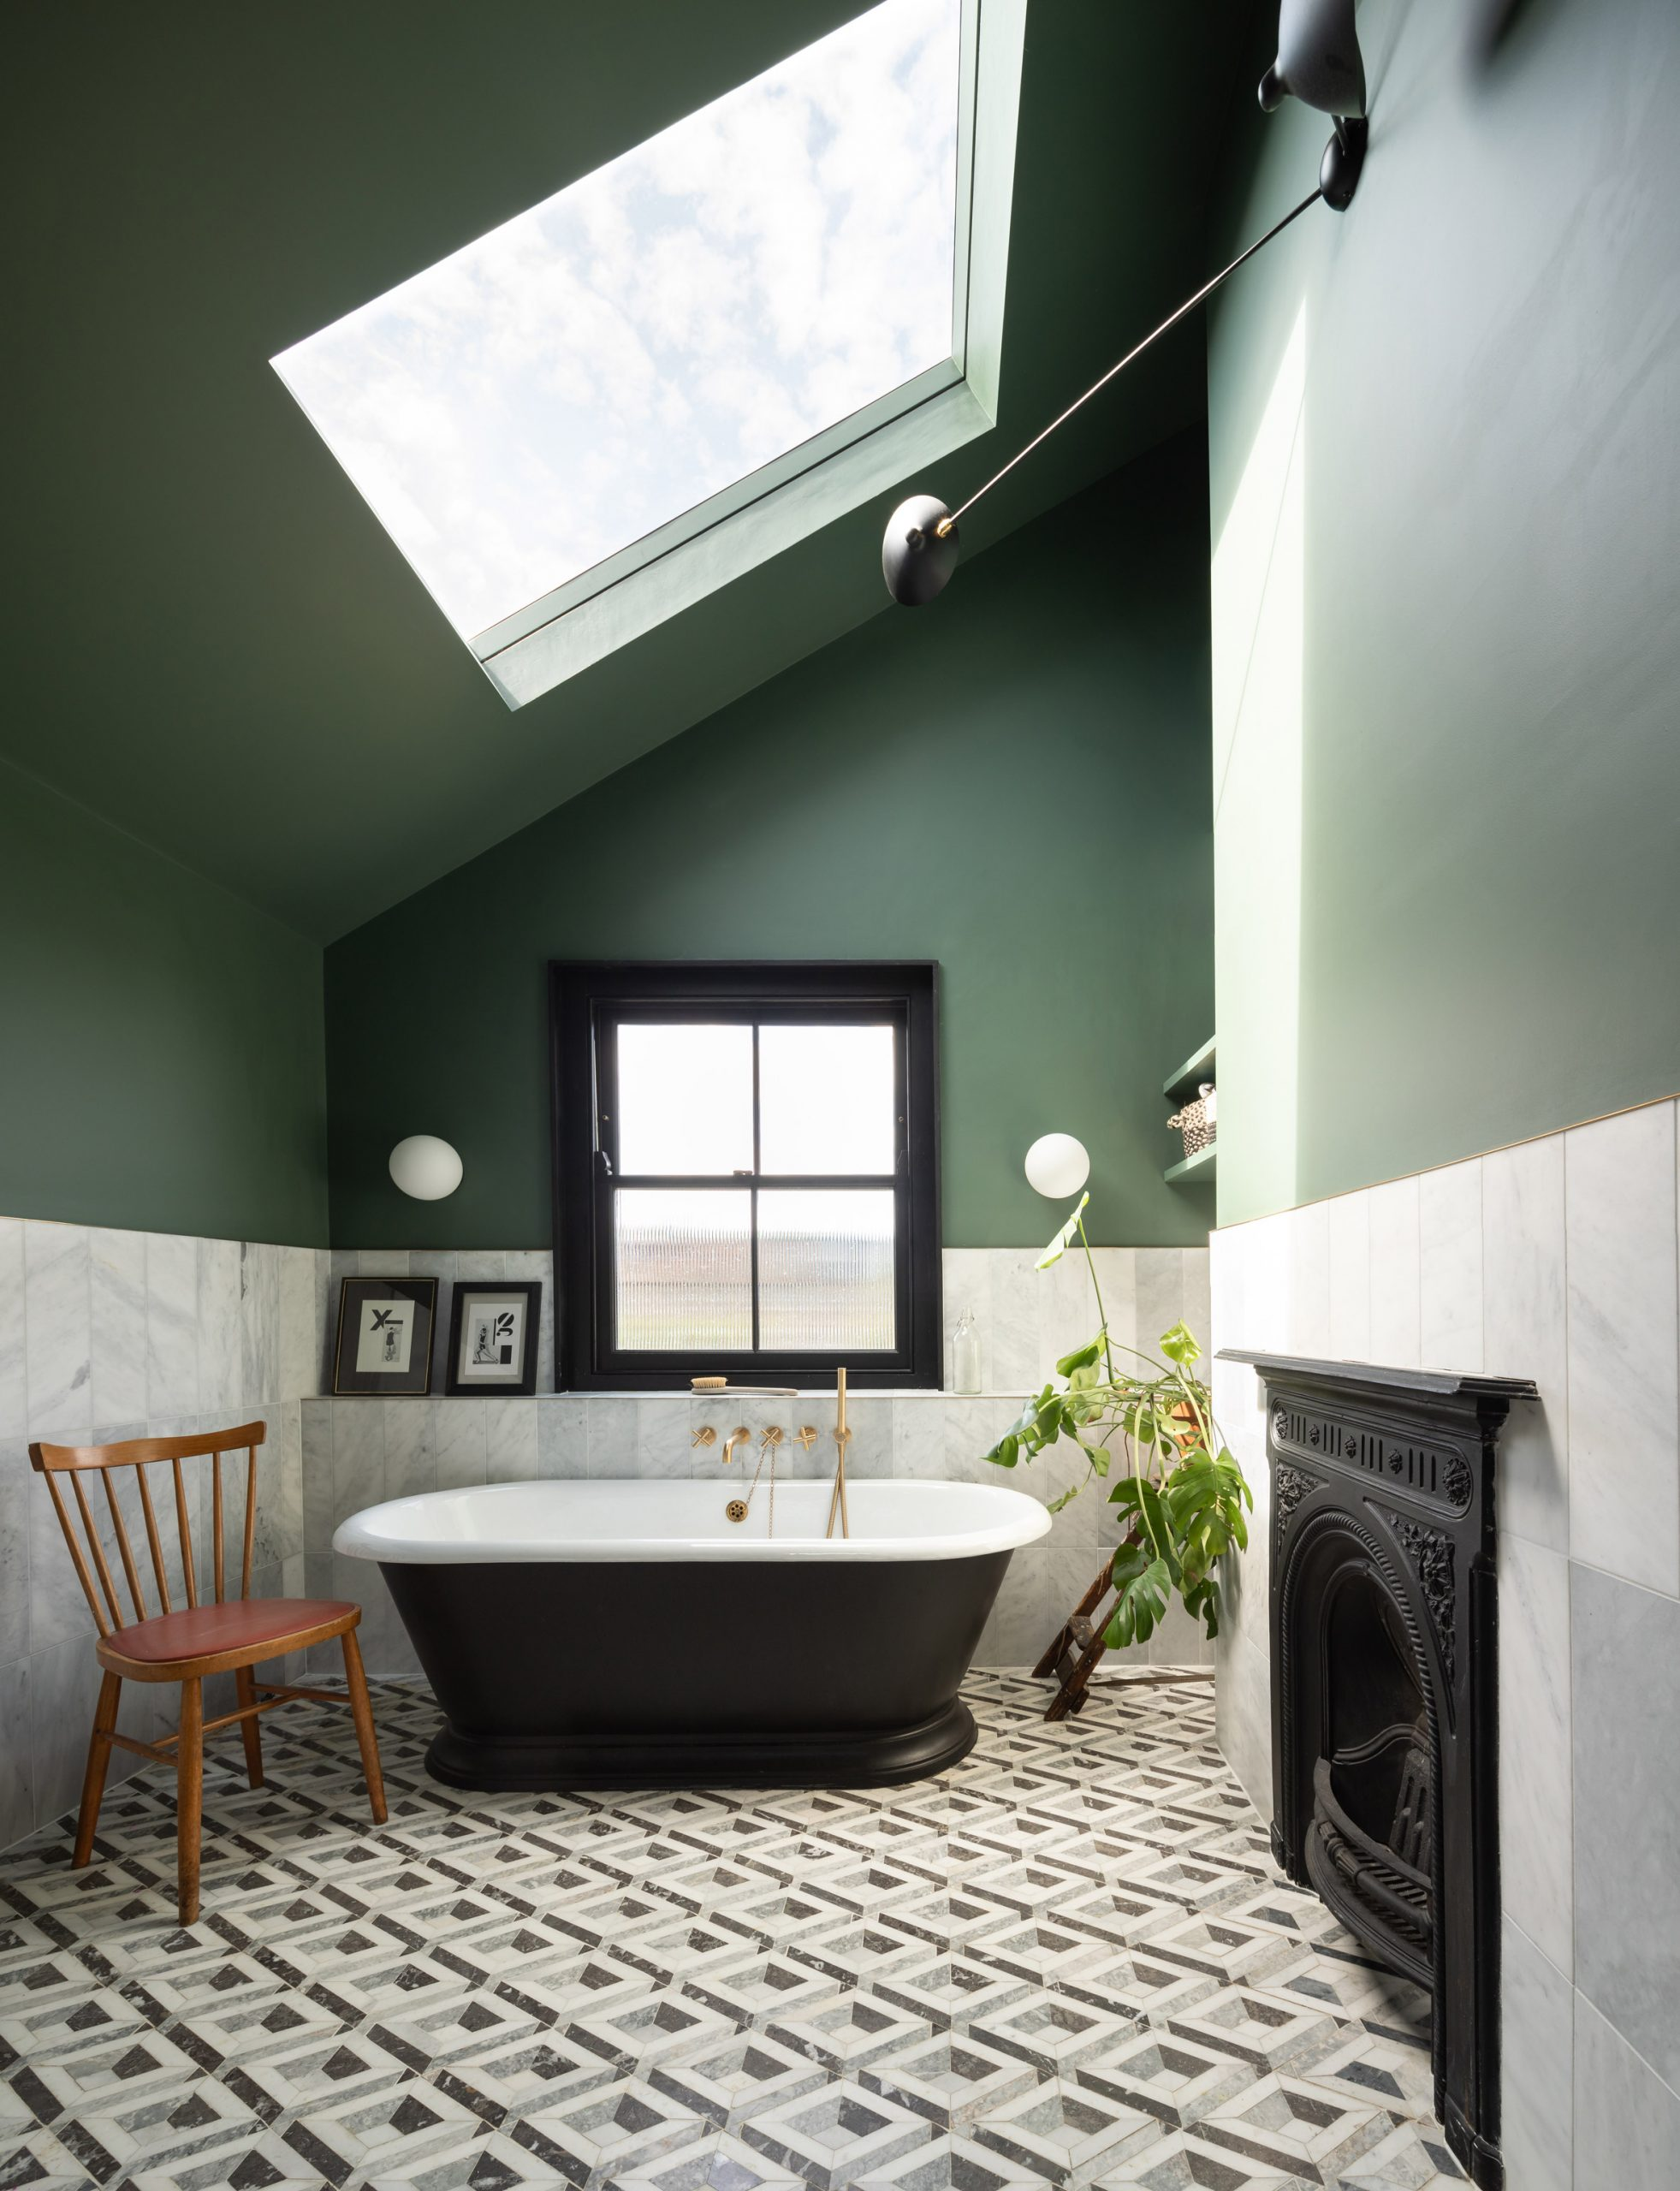 Freestanding jet-black tub